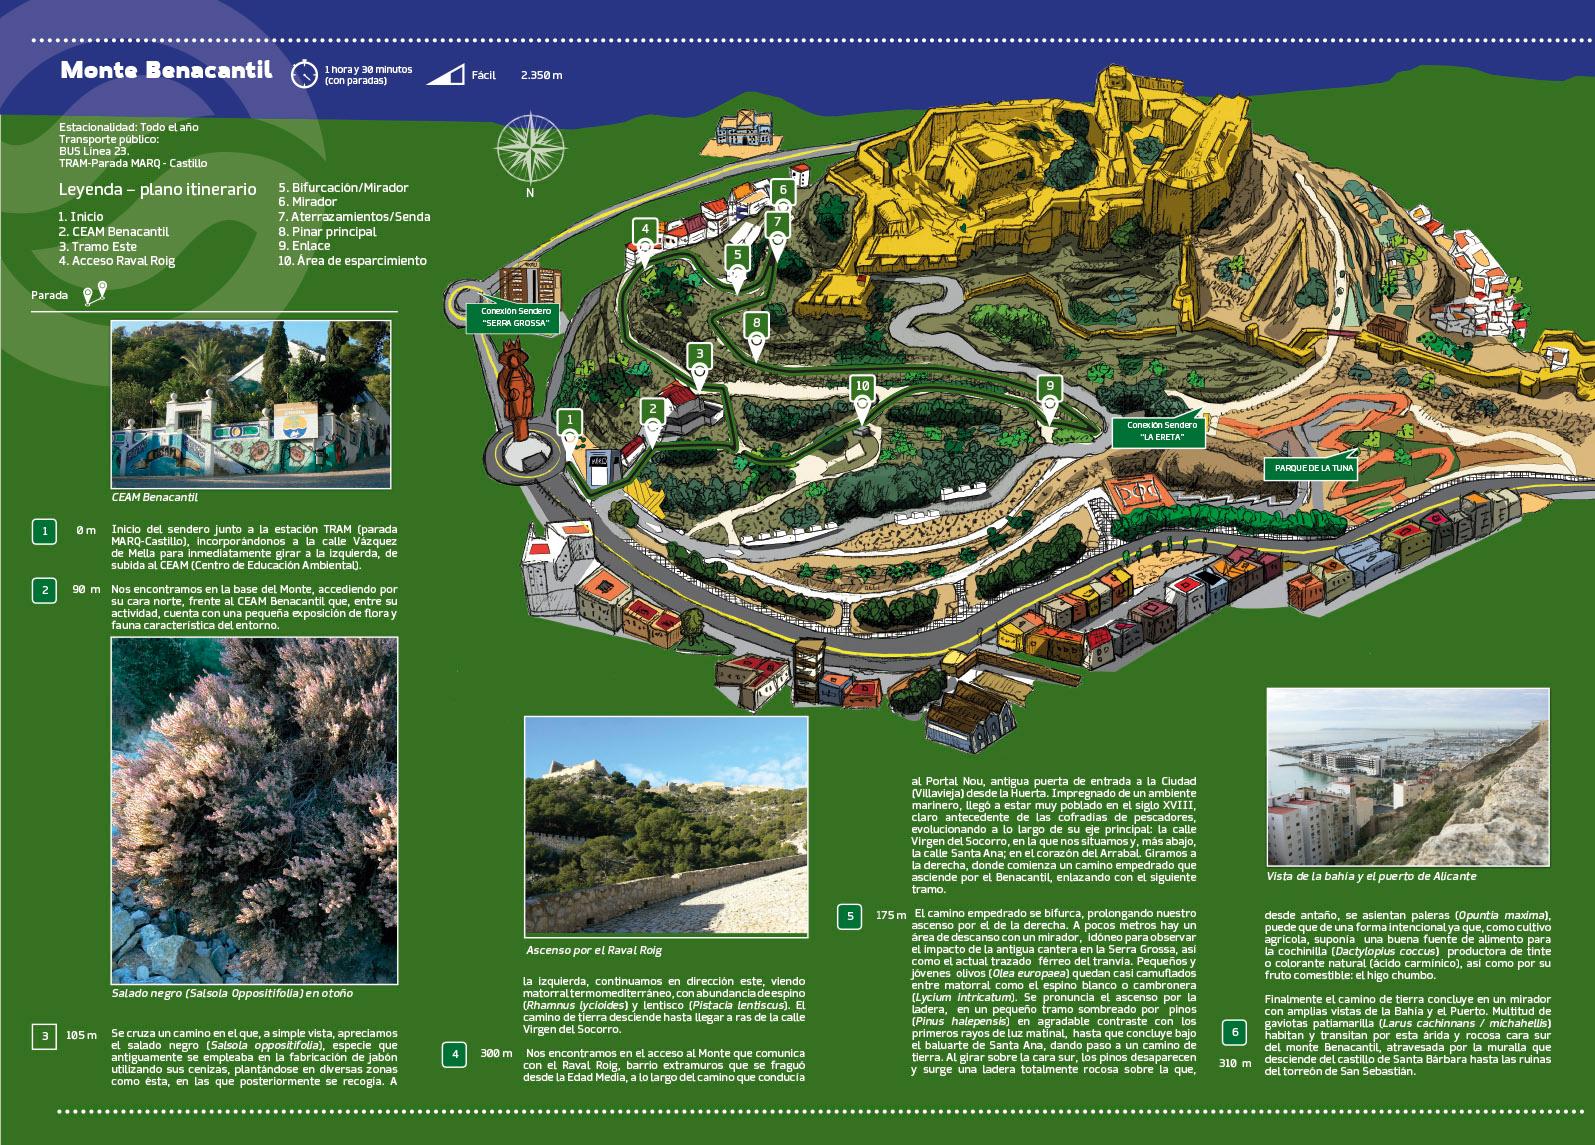 Sendero Urbano del Monte Benacantil